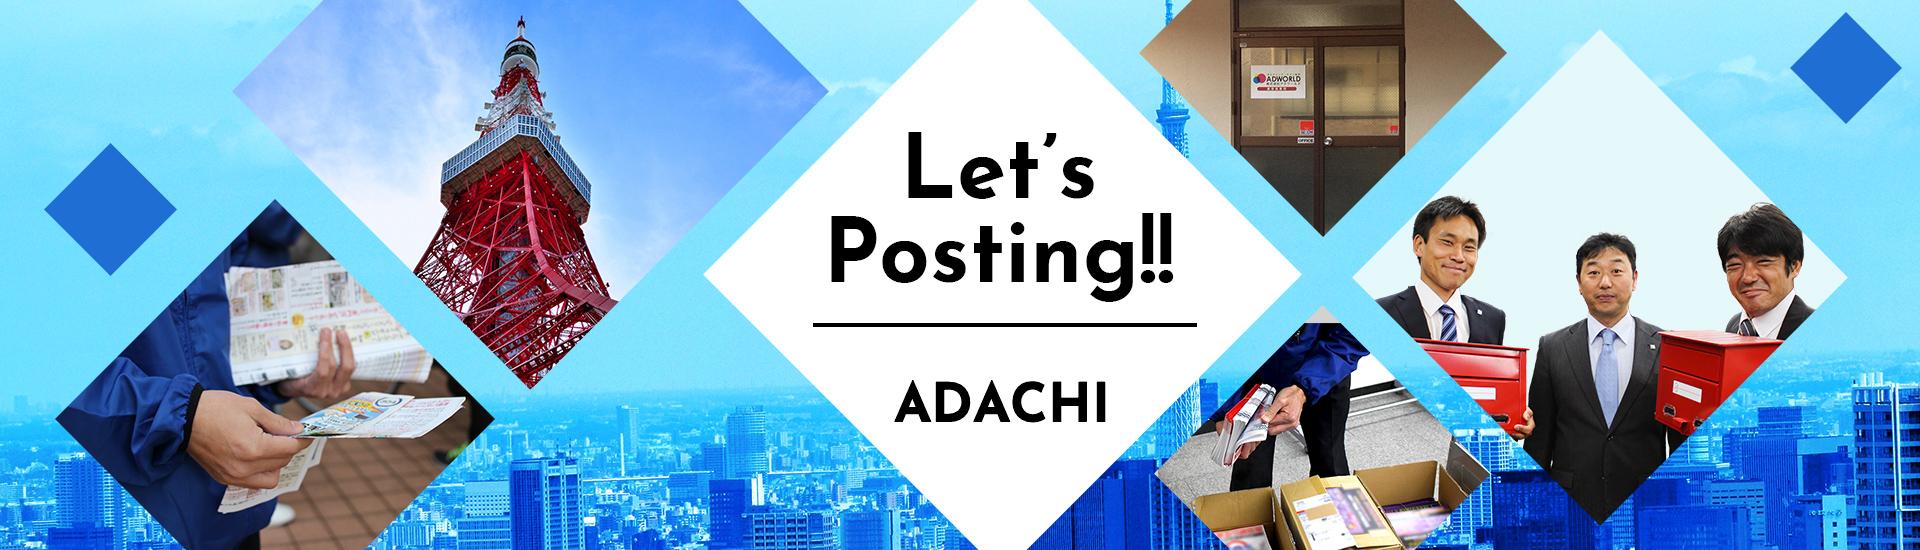 Let's Posting! -adachi-